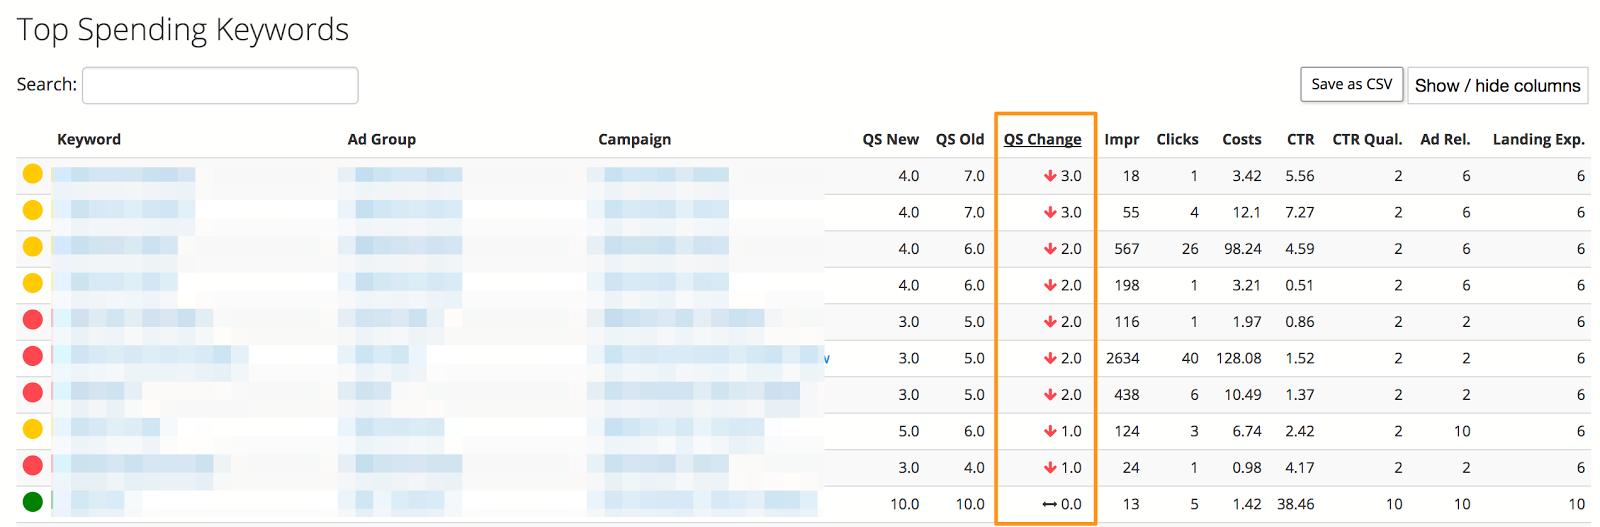 Biggest QS Drops By Keywords.png